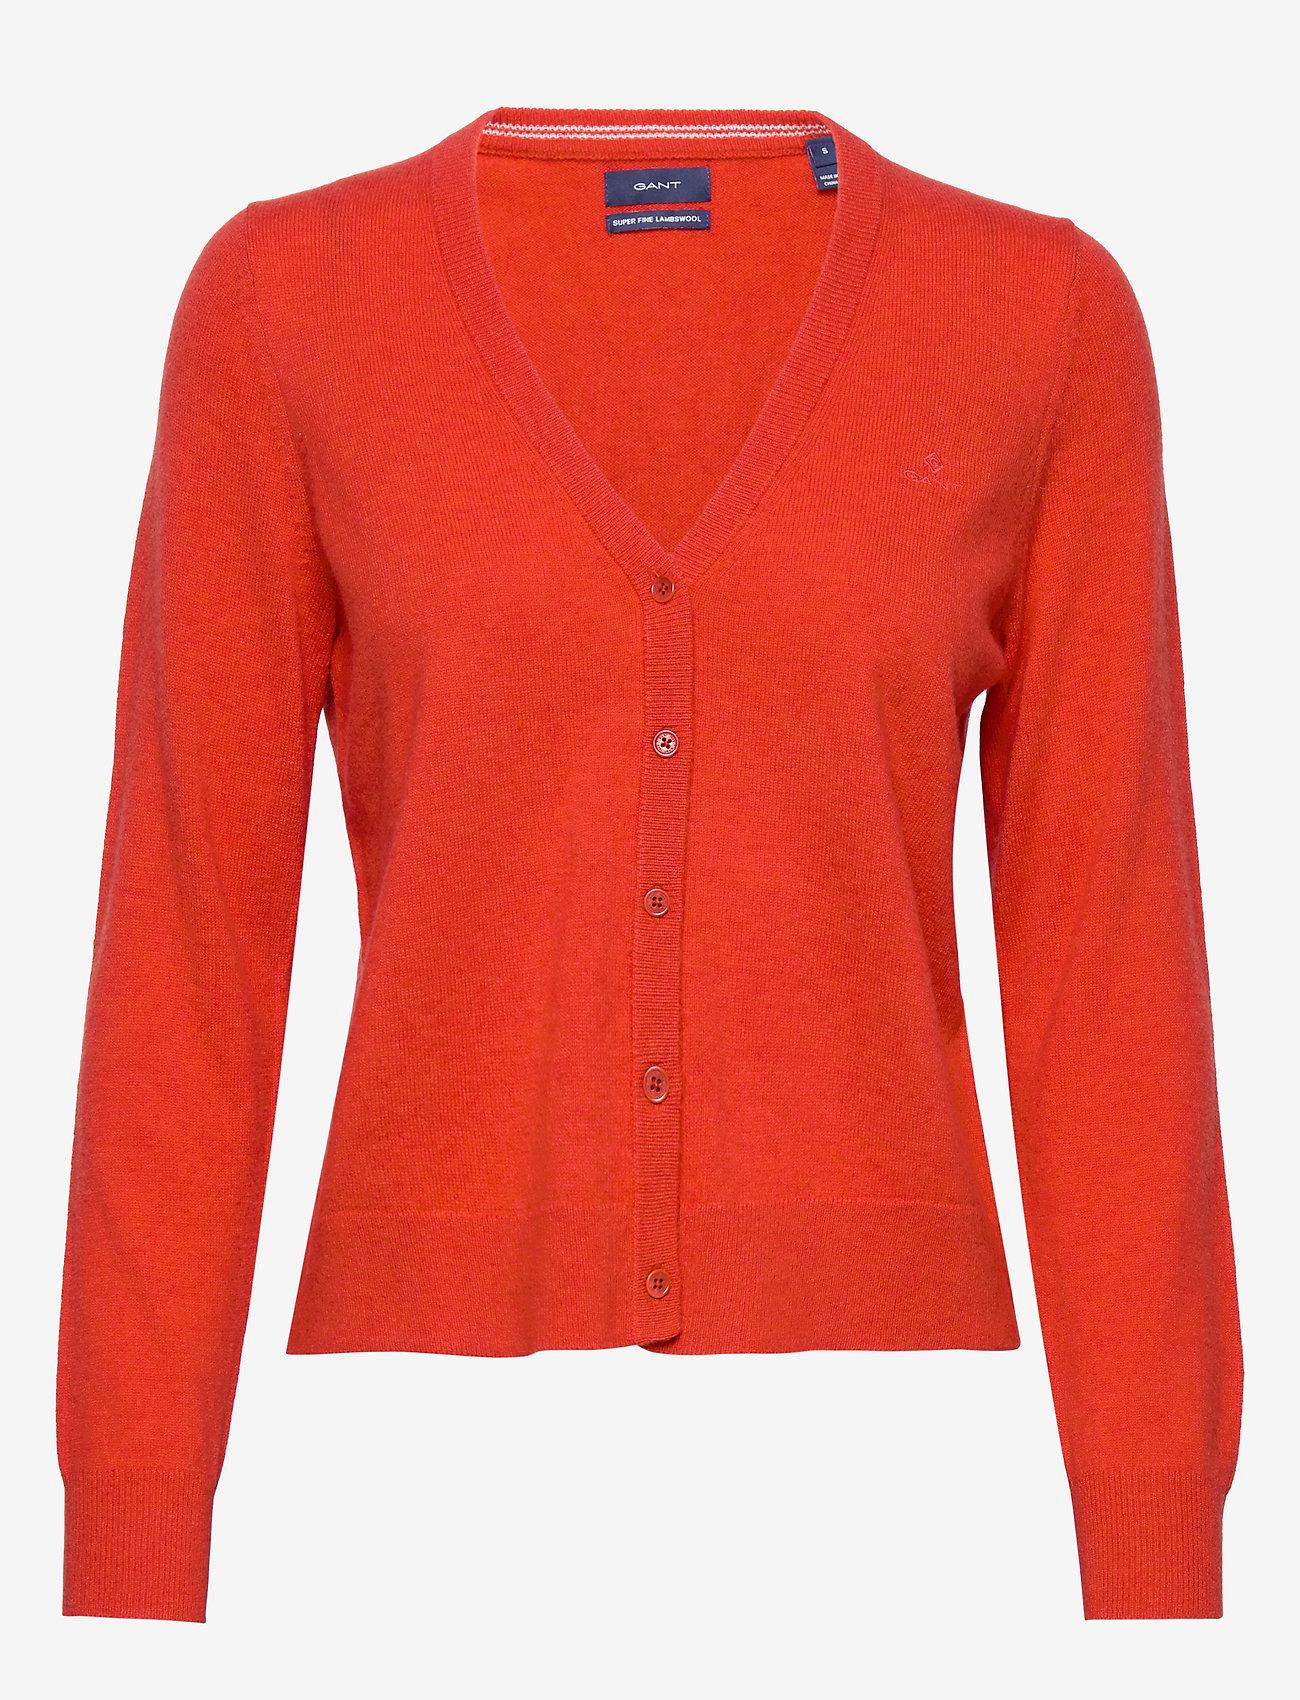 Gant - SUPERFINE LAMBSWOOL CARDIGAN - neuletakit - blood orange